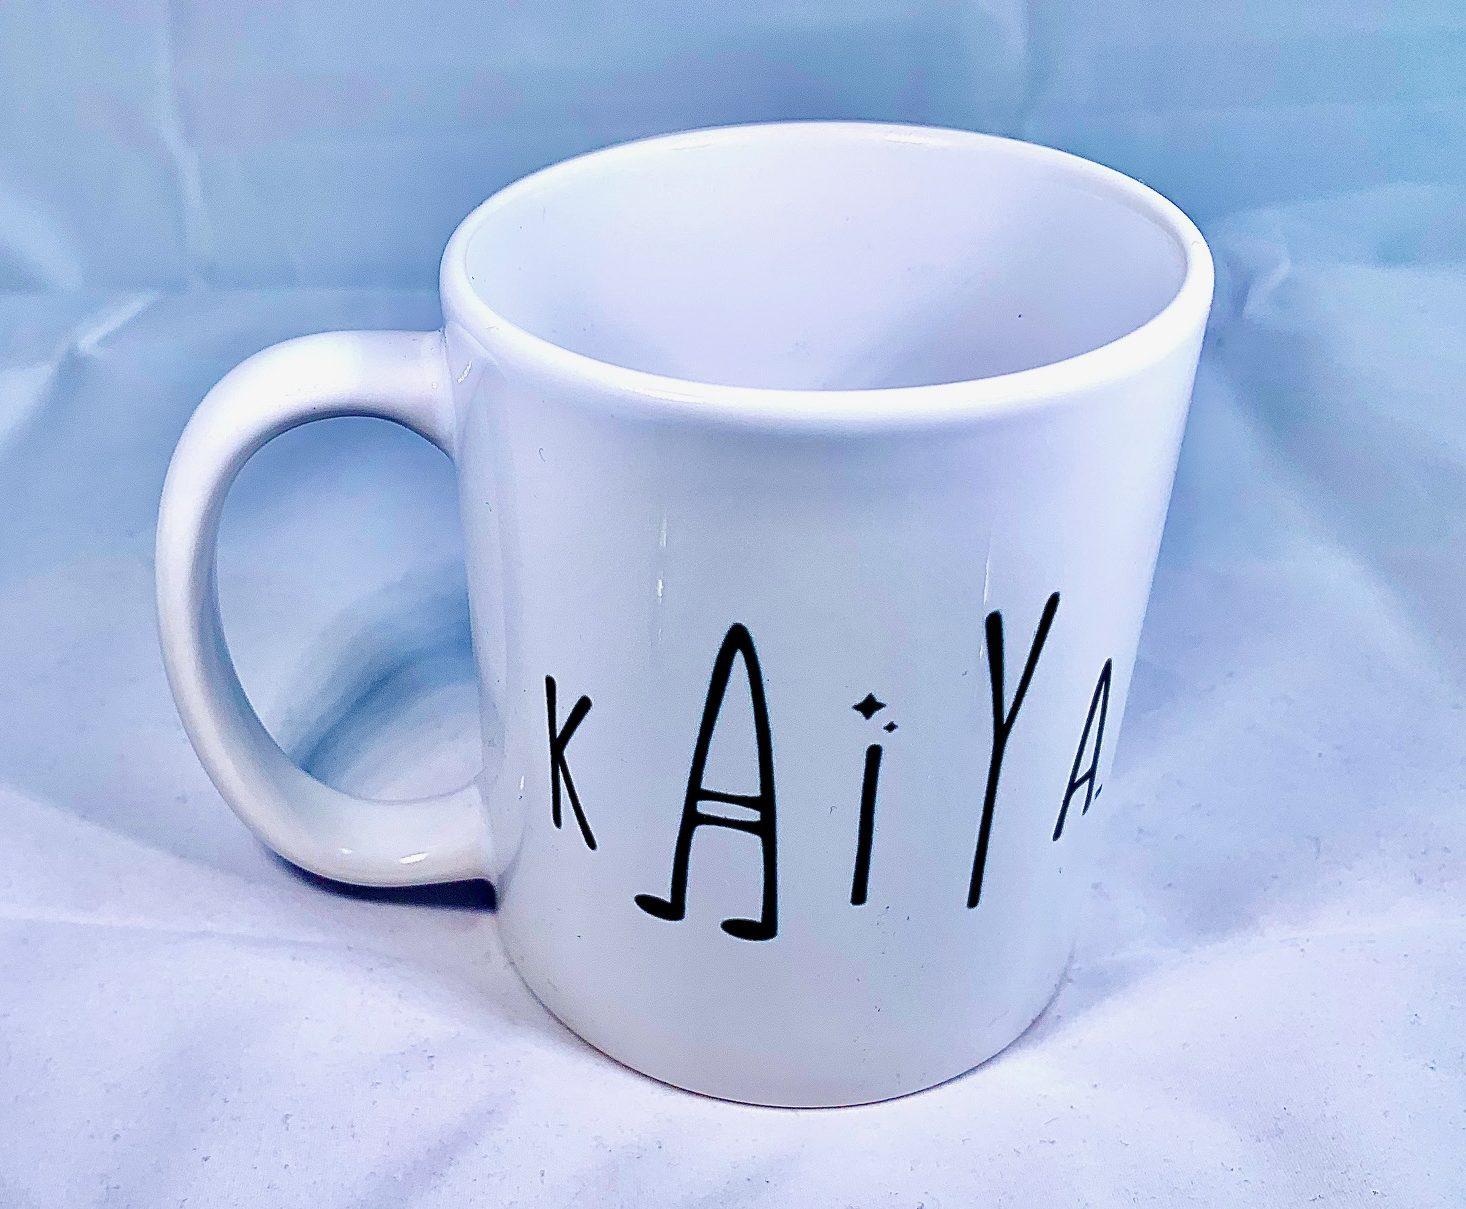 Kaiya logo mug top view